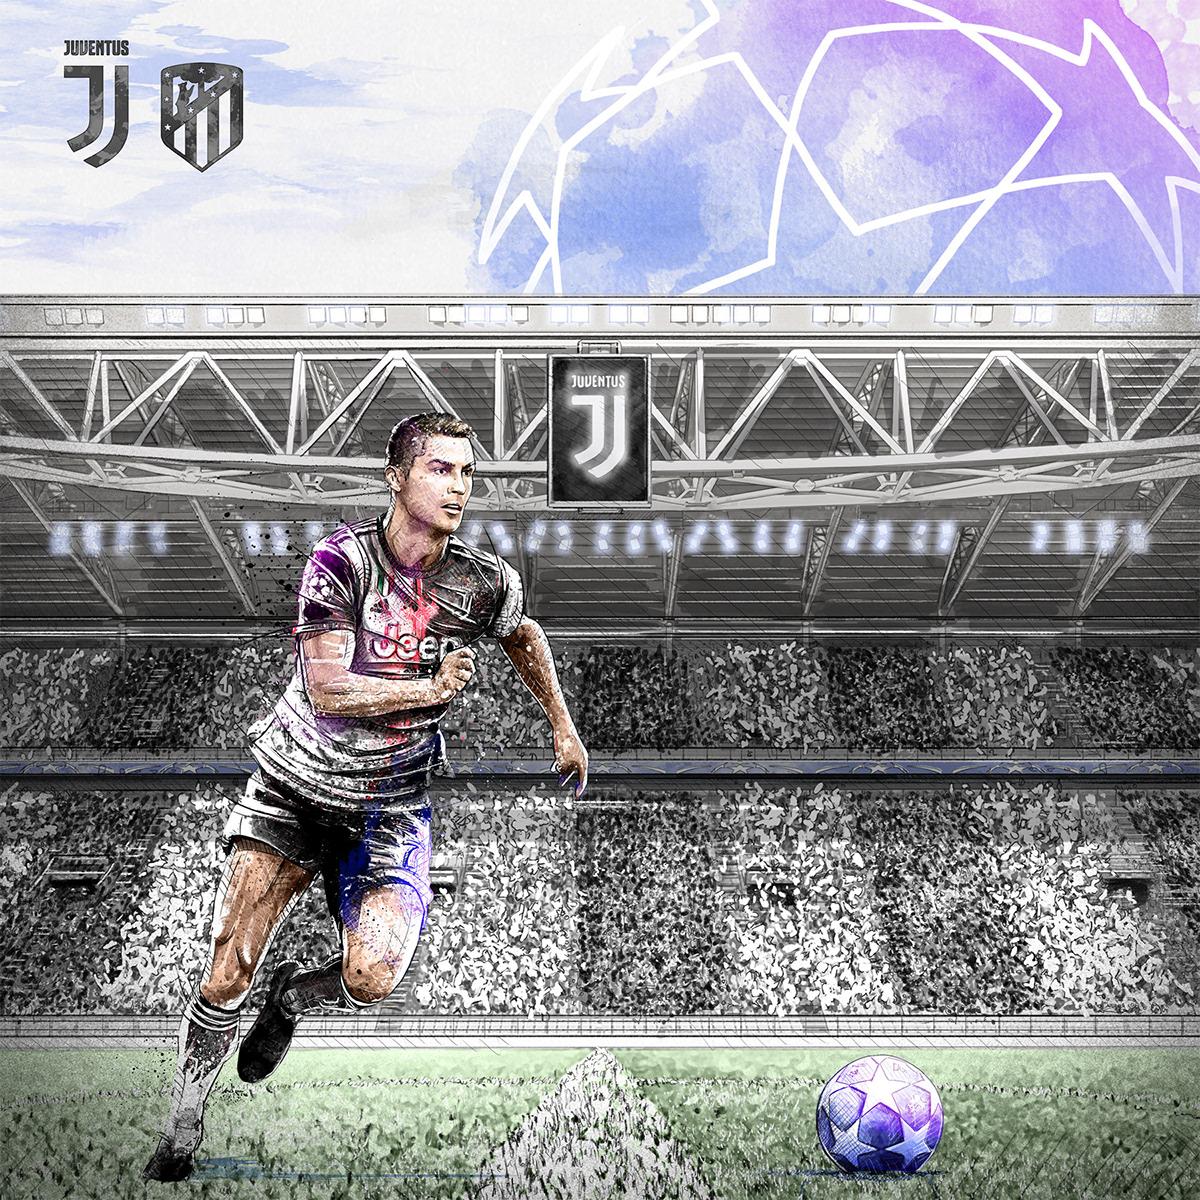 athletes champions league Dynamic football Juventus Ronaldo soccer sport sportive watercolor